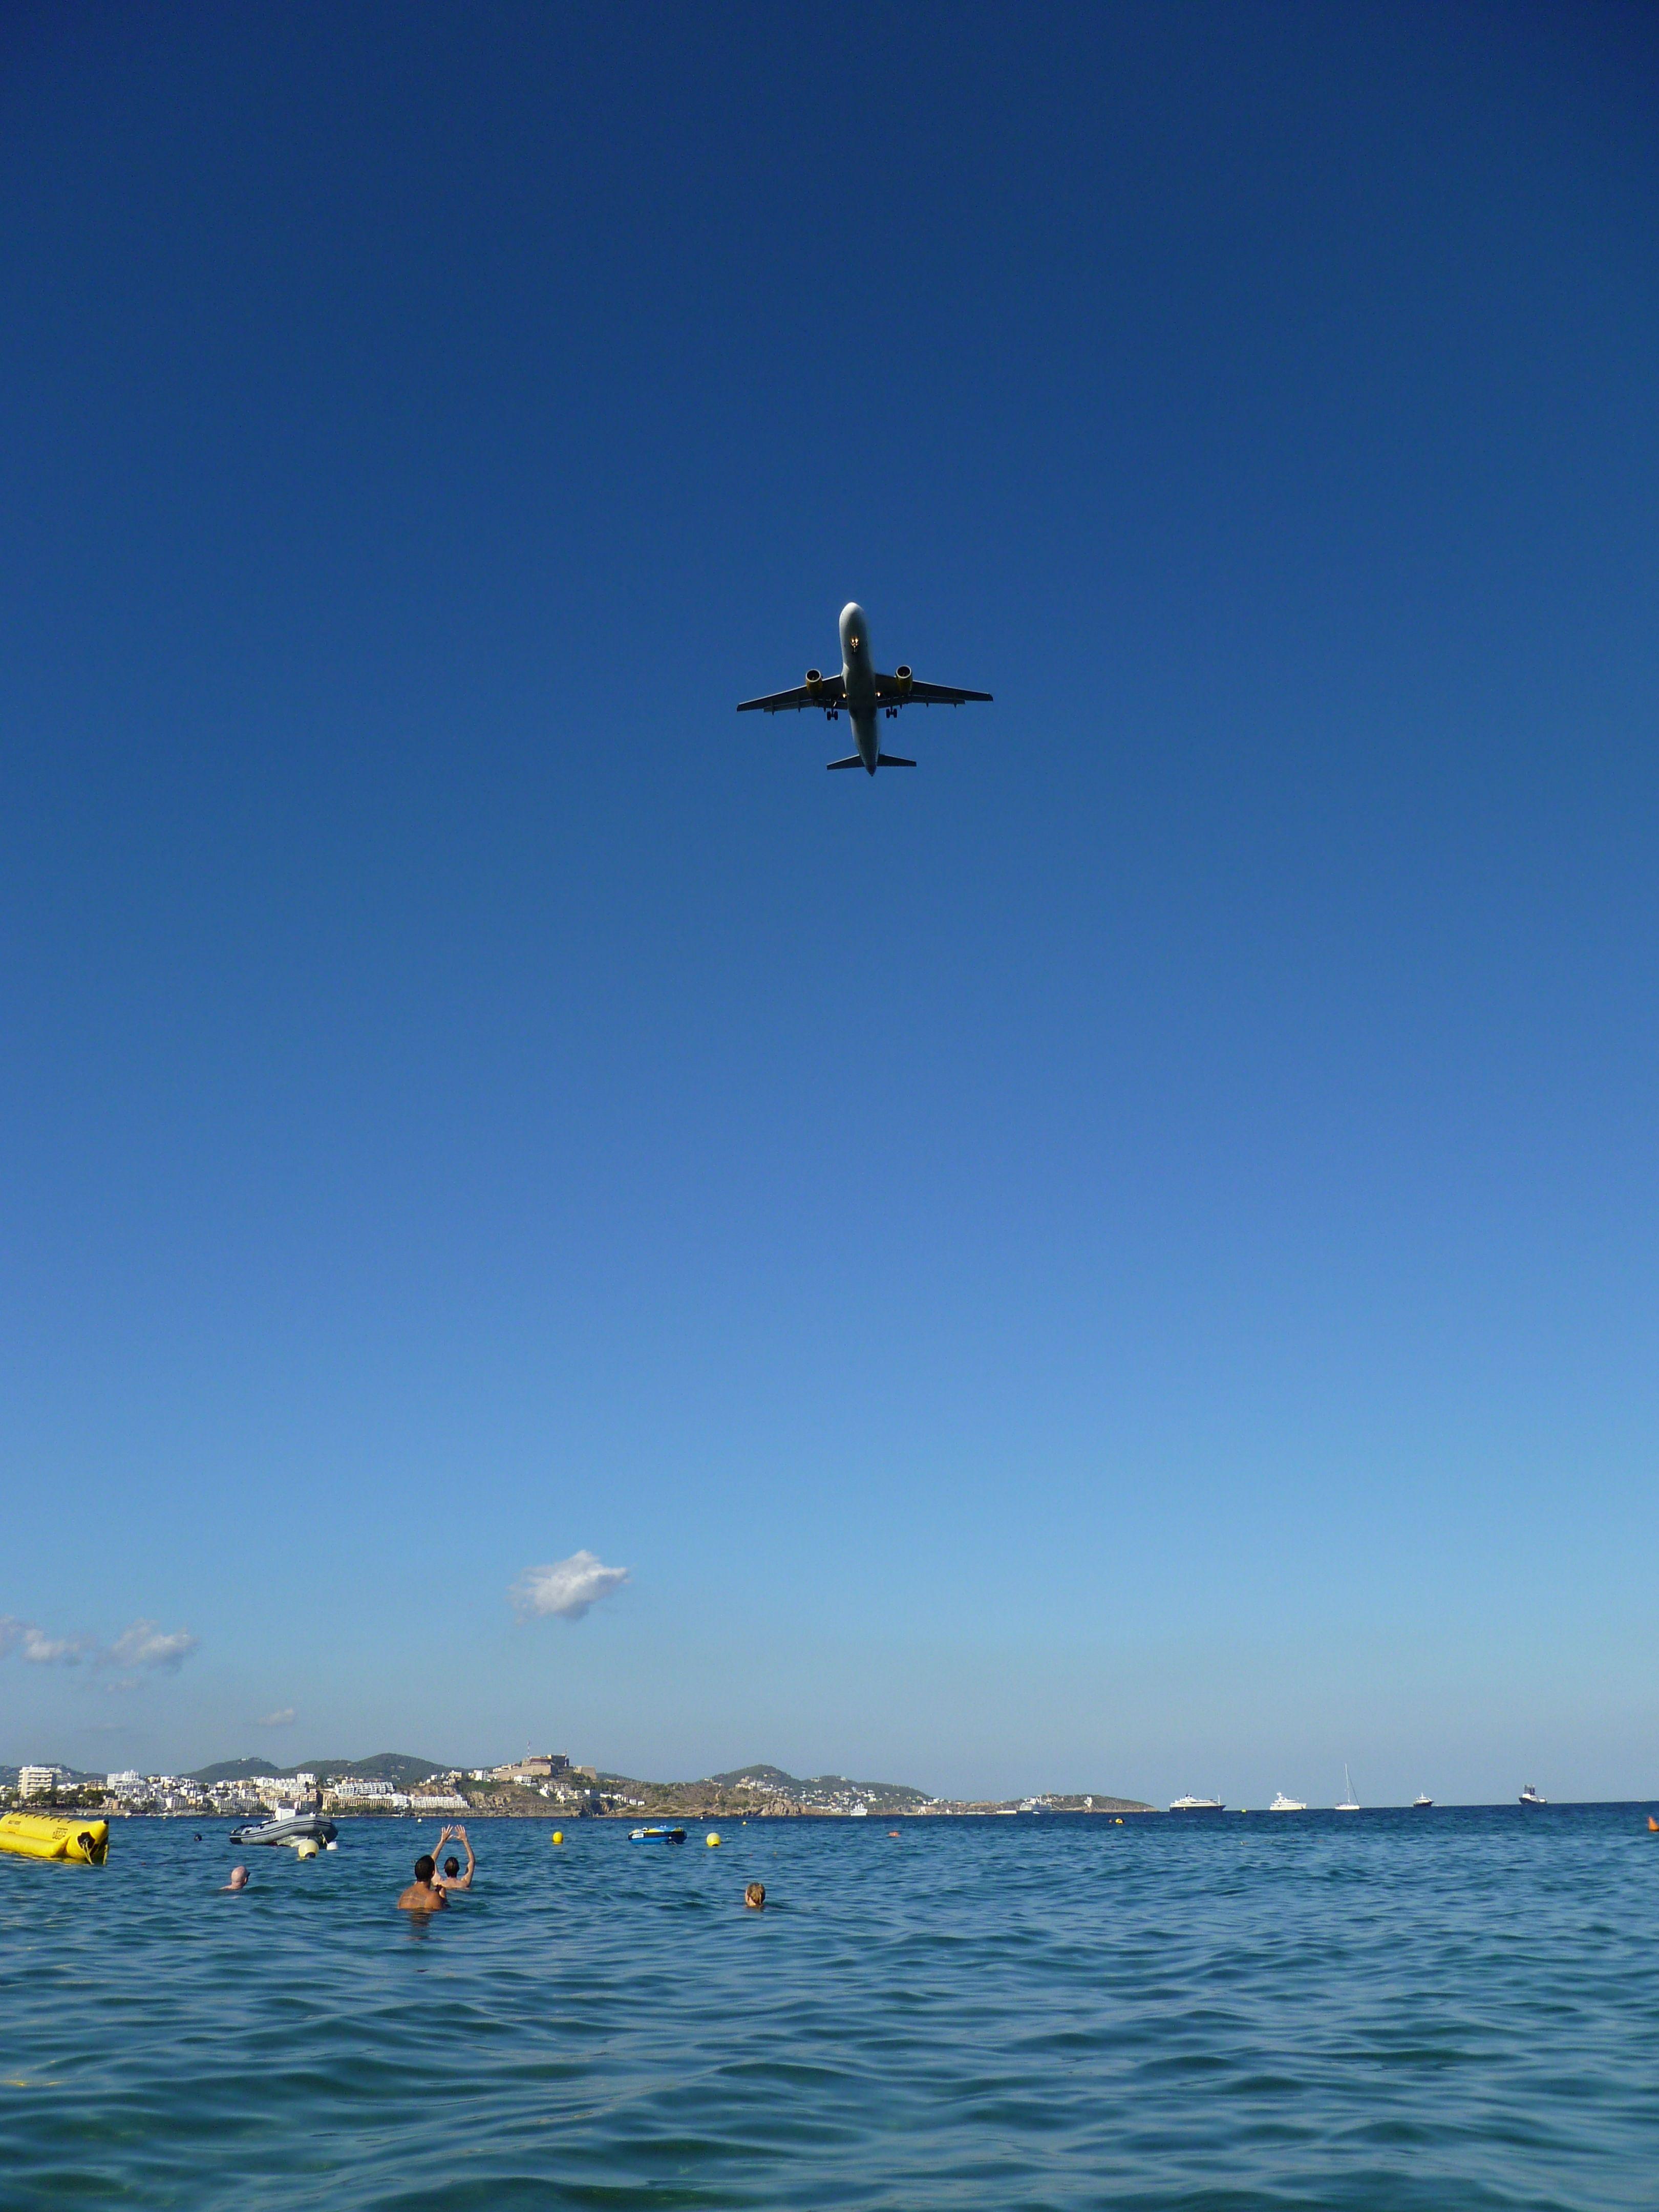 Playa den Bossa- Ibiza, Spain